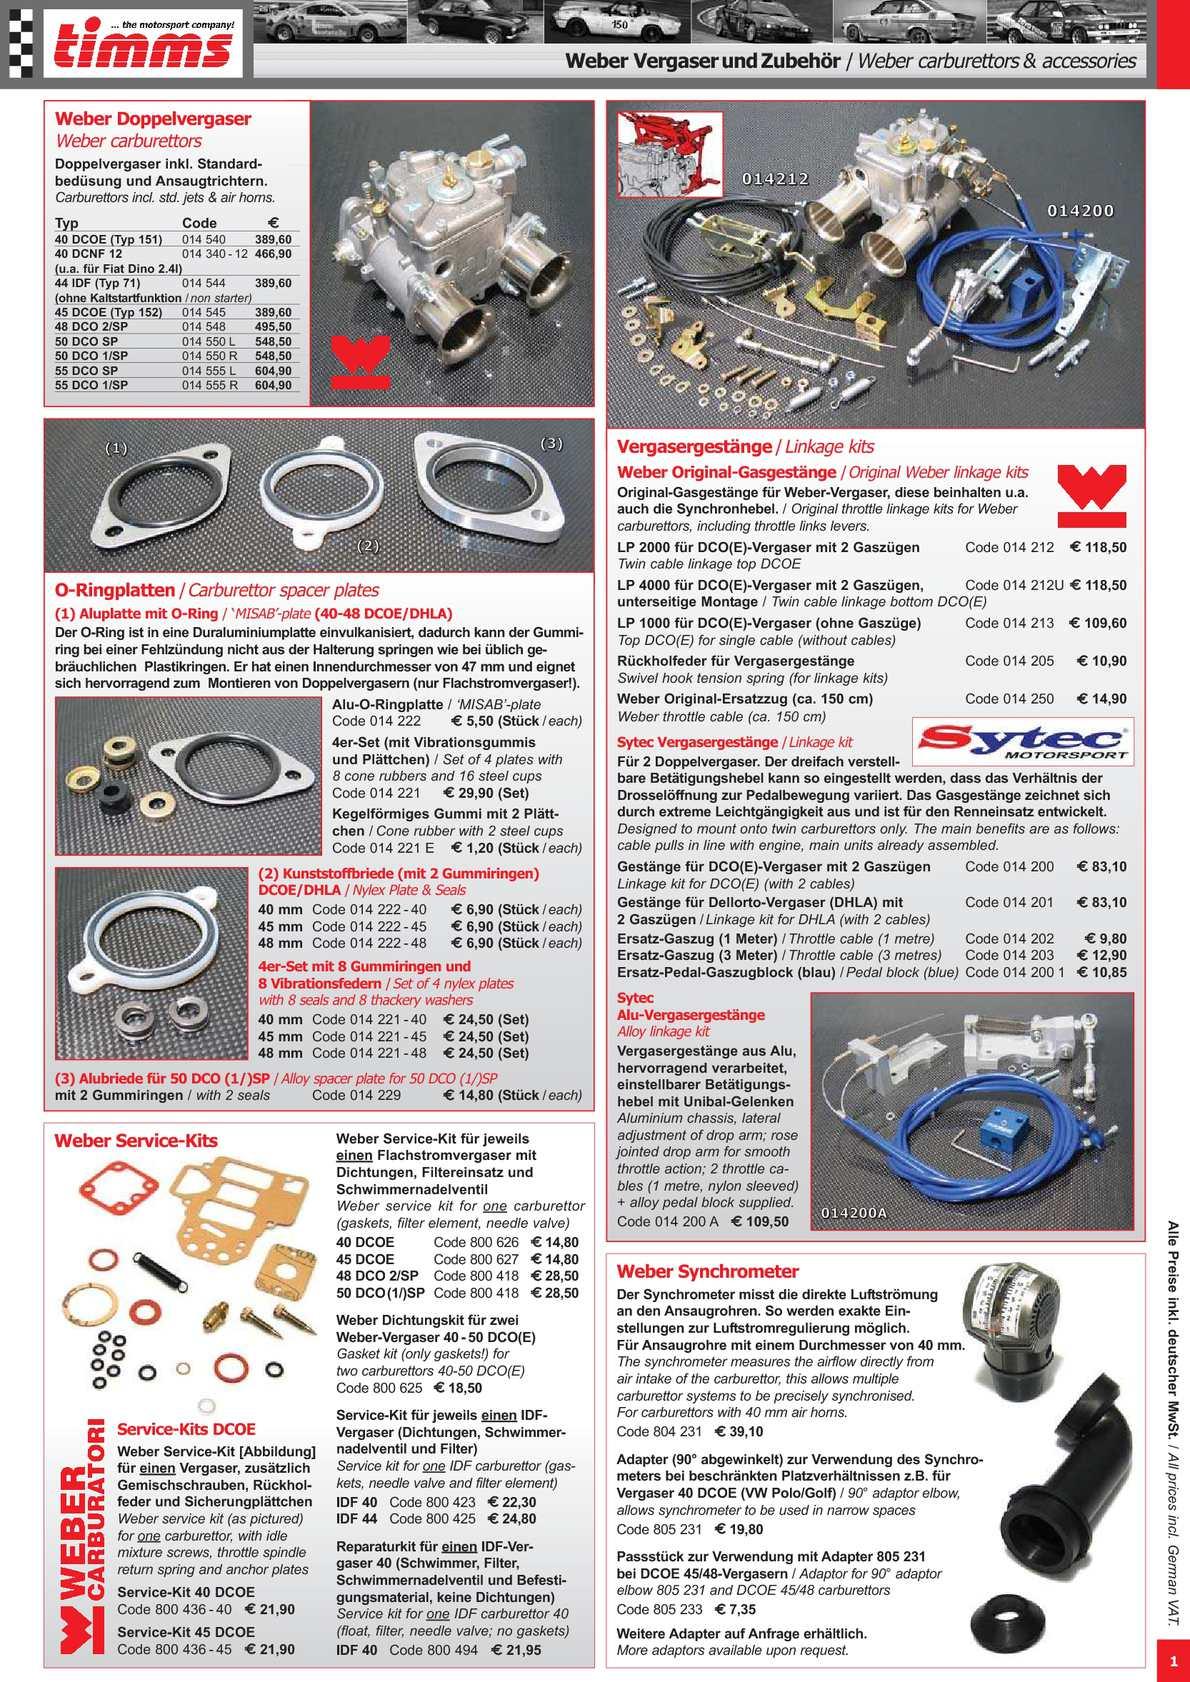 053 7 Seiten Selected Material Alfa Romeo 166